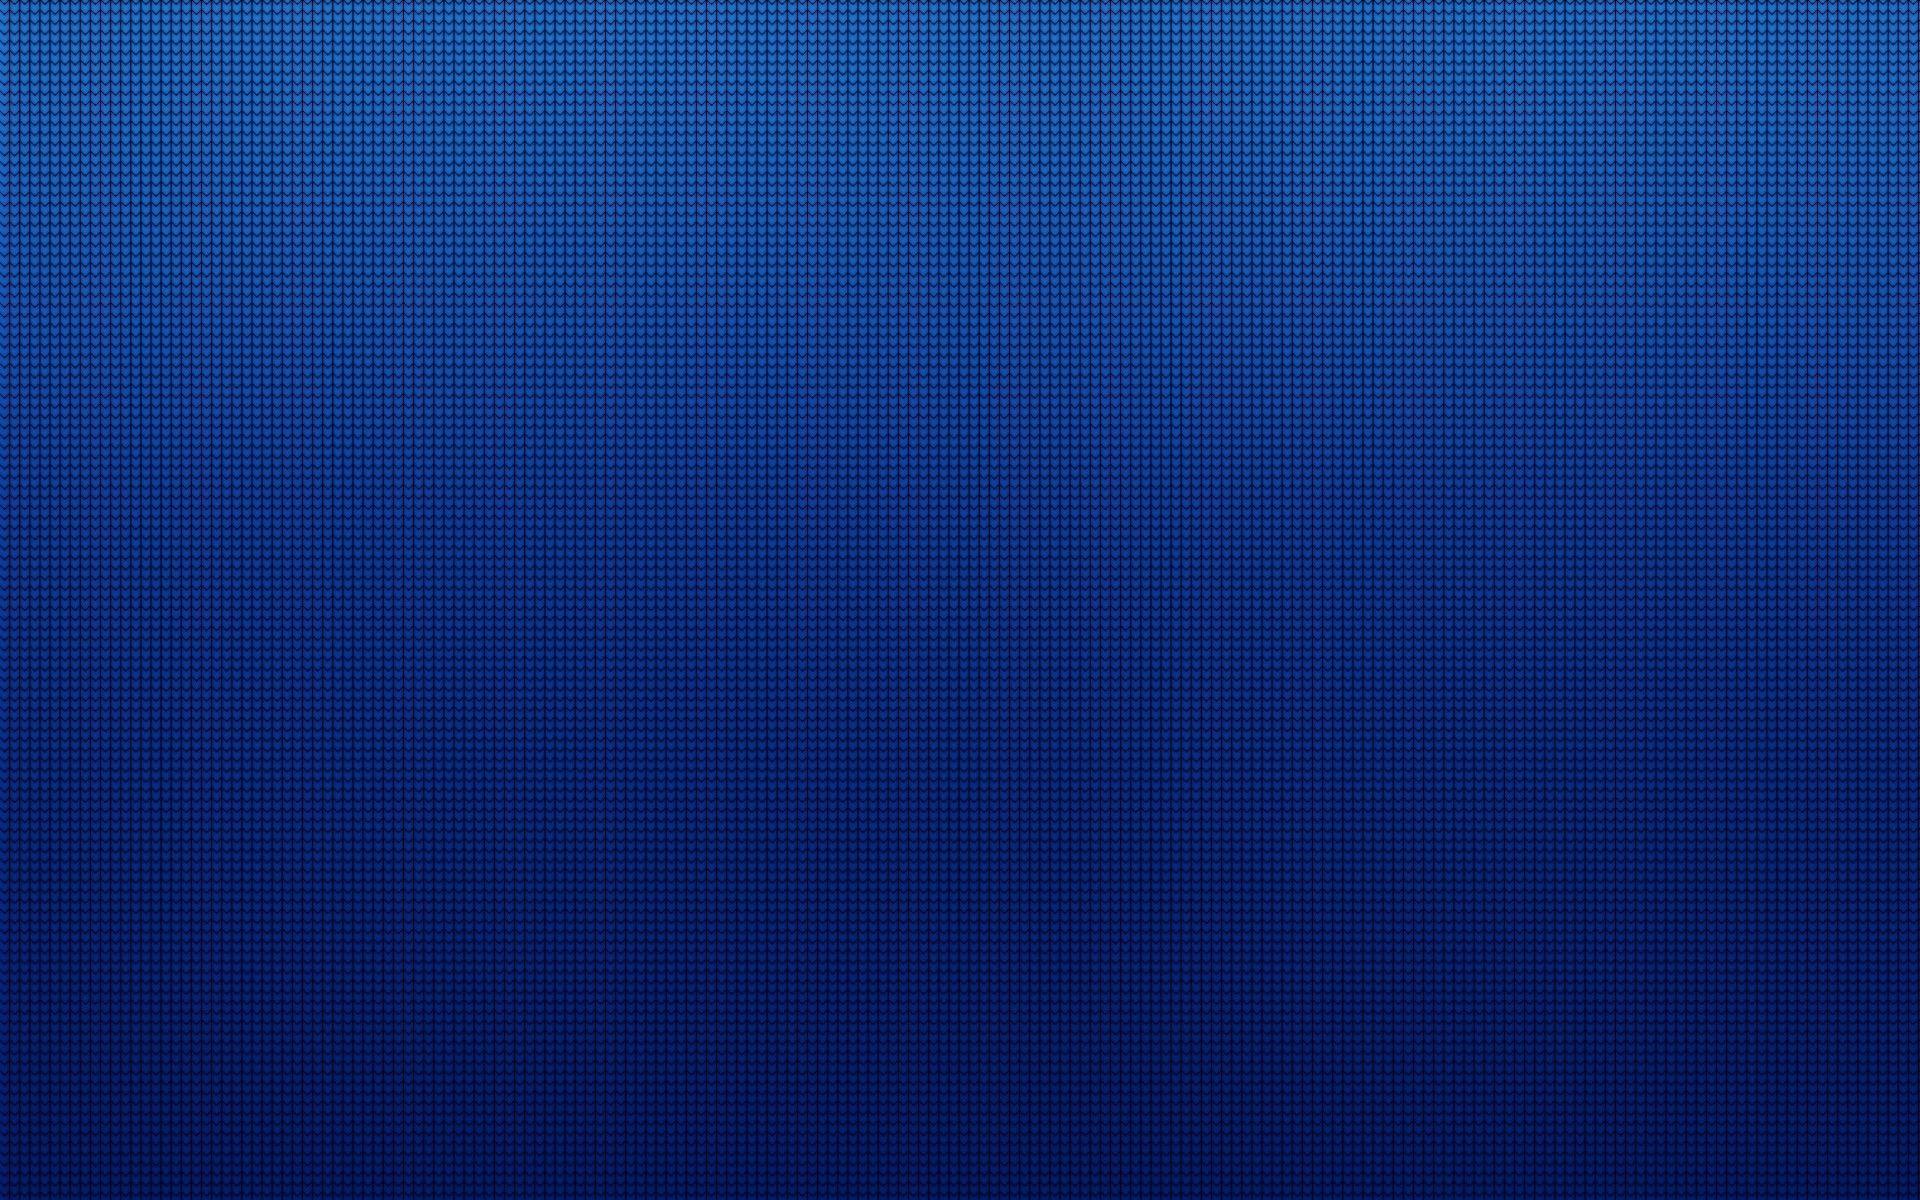 plain blue backgrounds wallpapers